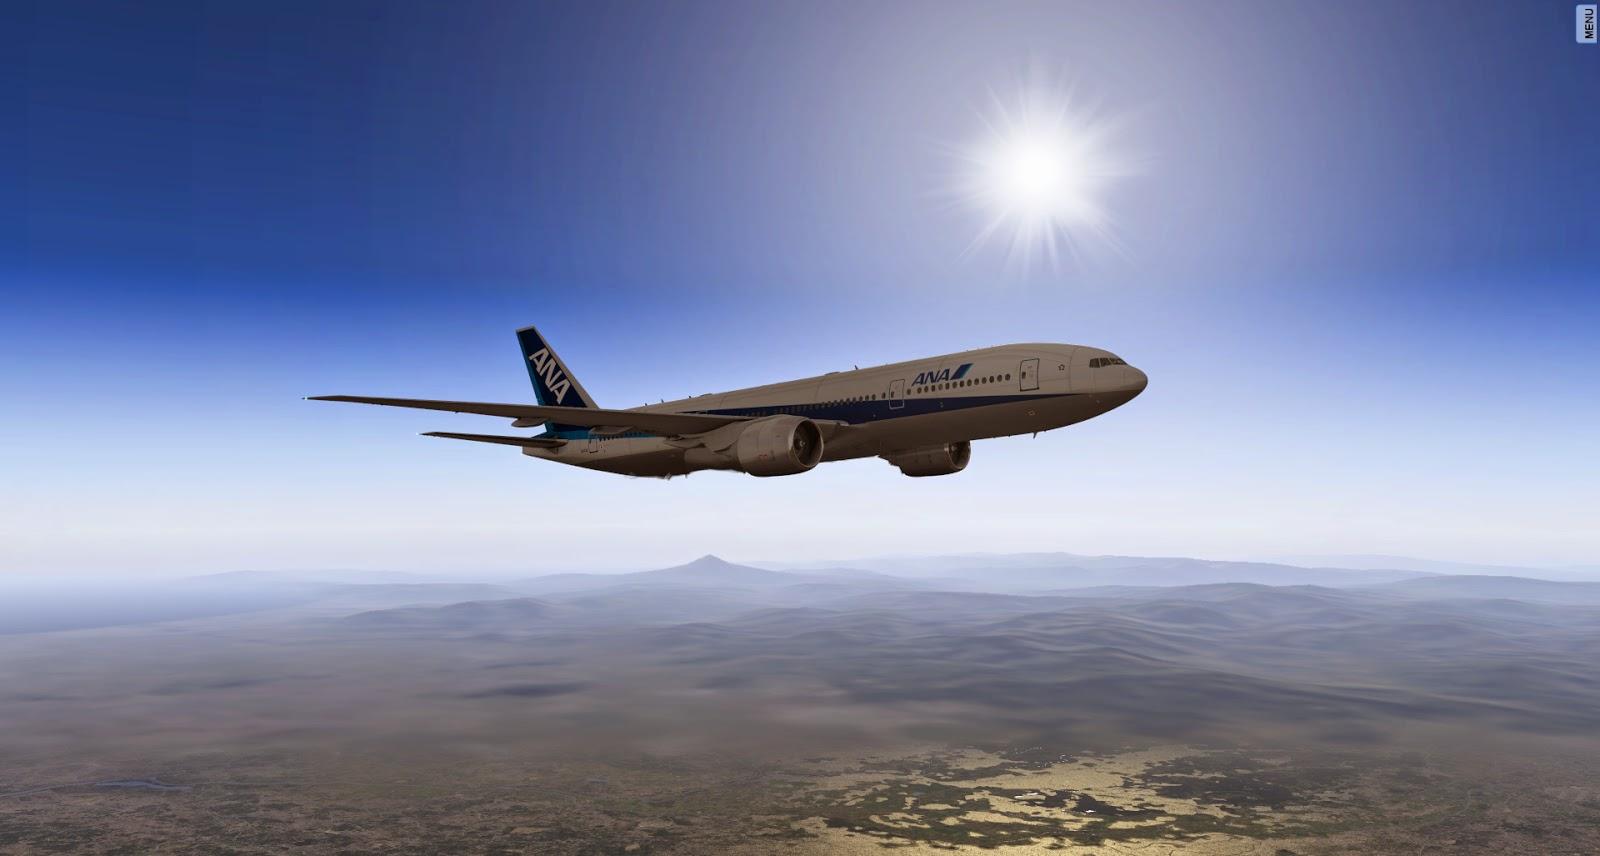 FLIGHT FACTOR BOEING 777 VERSION 1 7 | Article - Sun 02 Nov